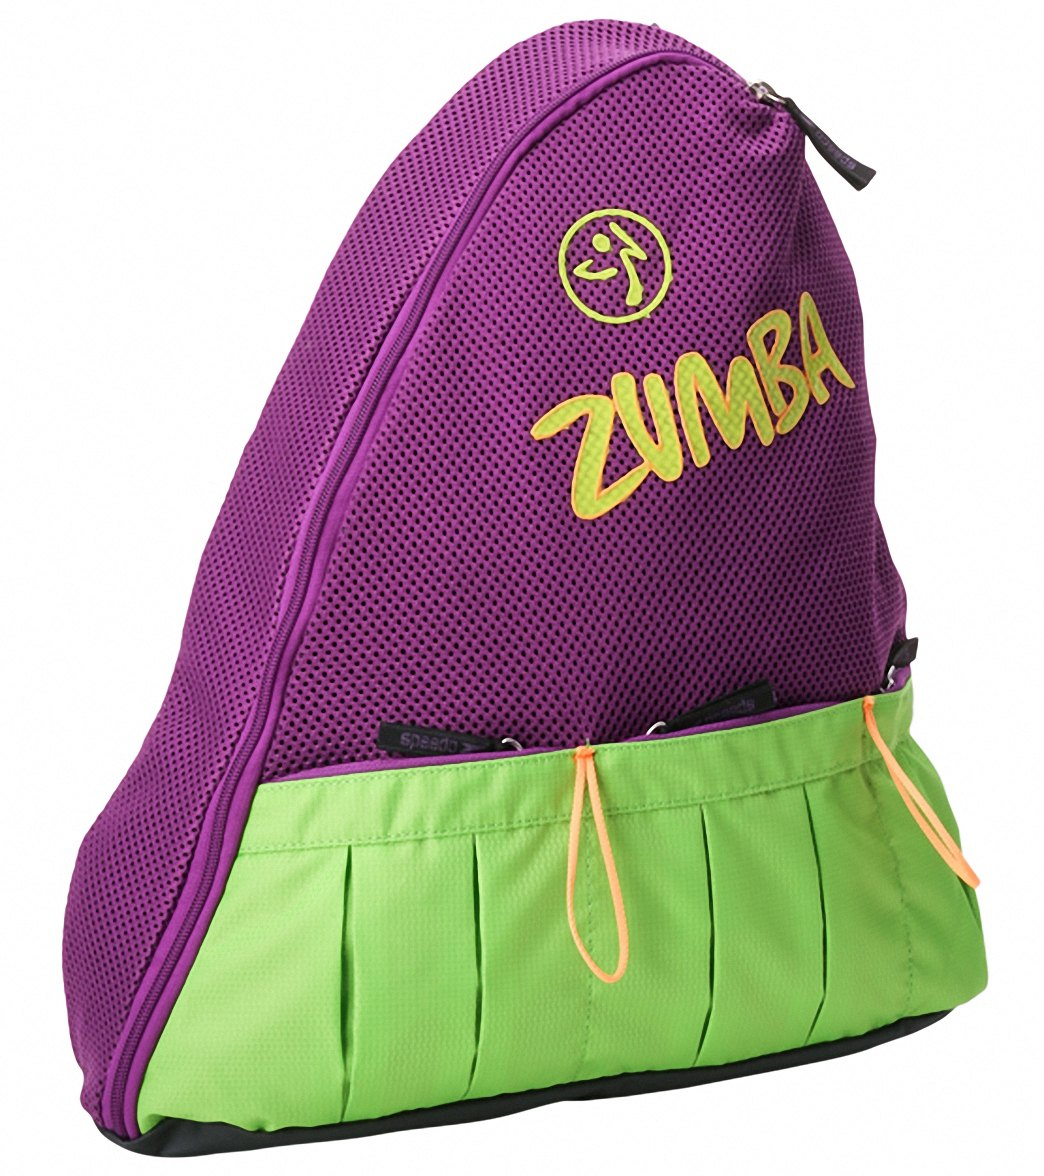 bab528c21c Aqua Zumba by Speedo Funk Phenom Sling Bag at SwimOutlet.com